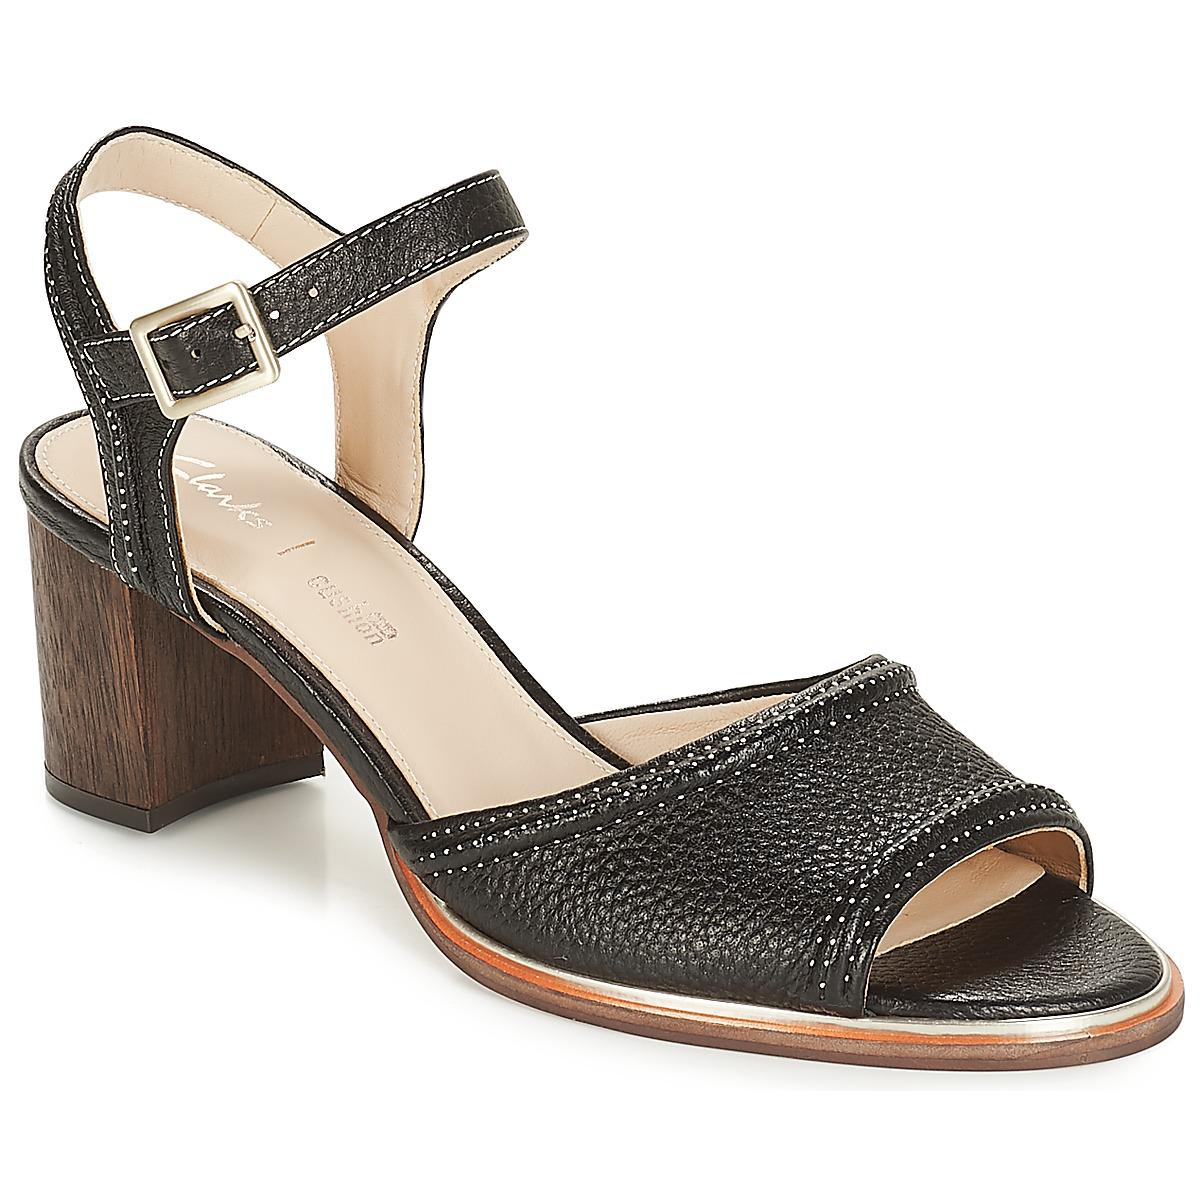 07eaaed3e5e0 Clarks Ellis Clara Women s Sandals In Black in Black - Lyst